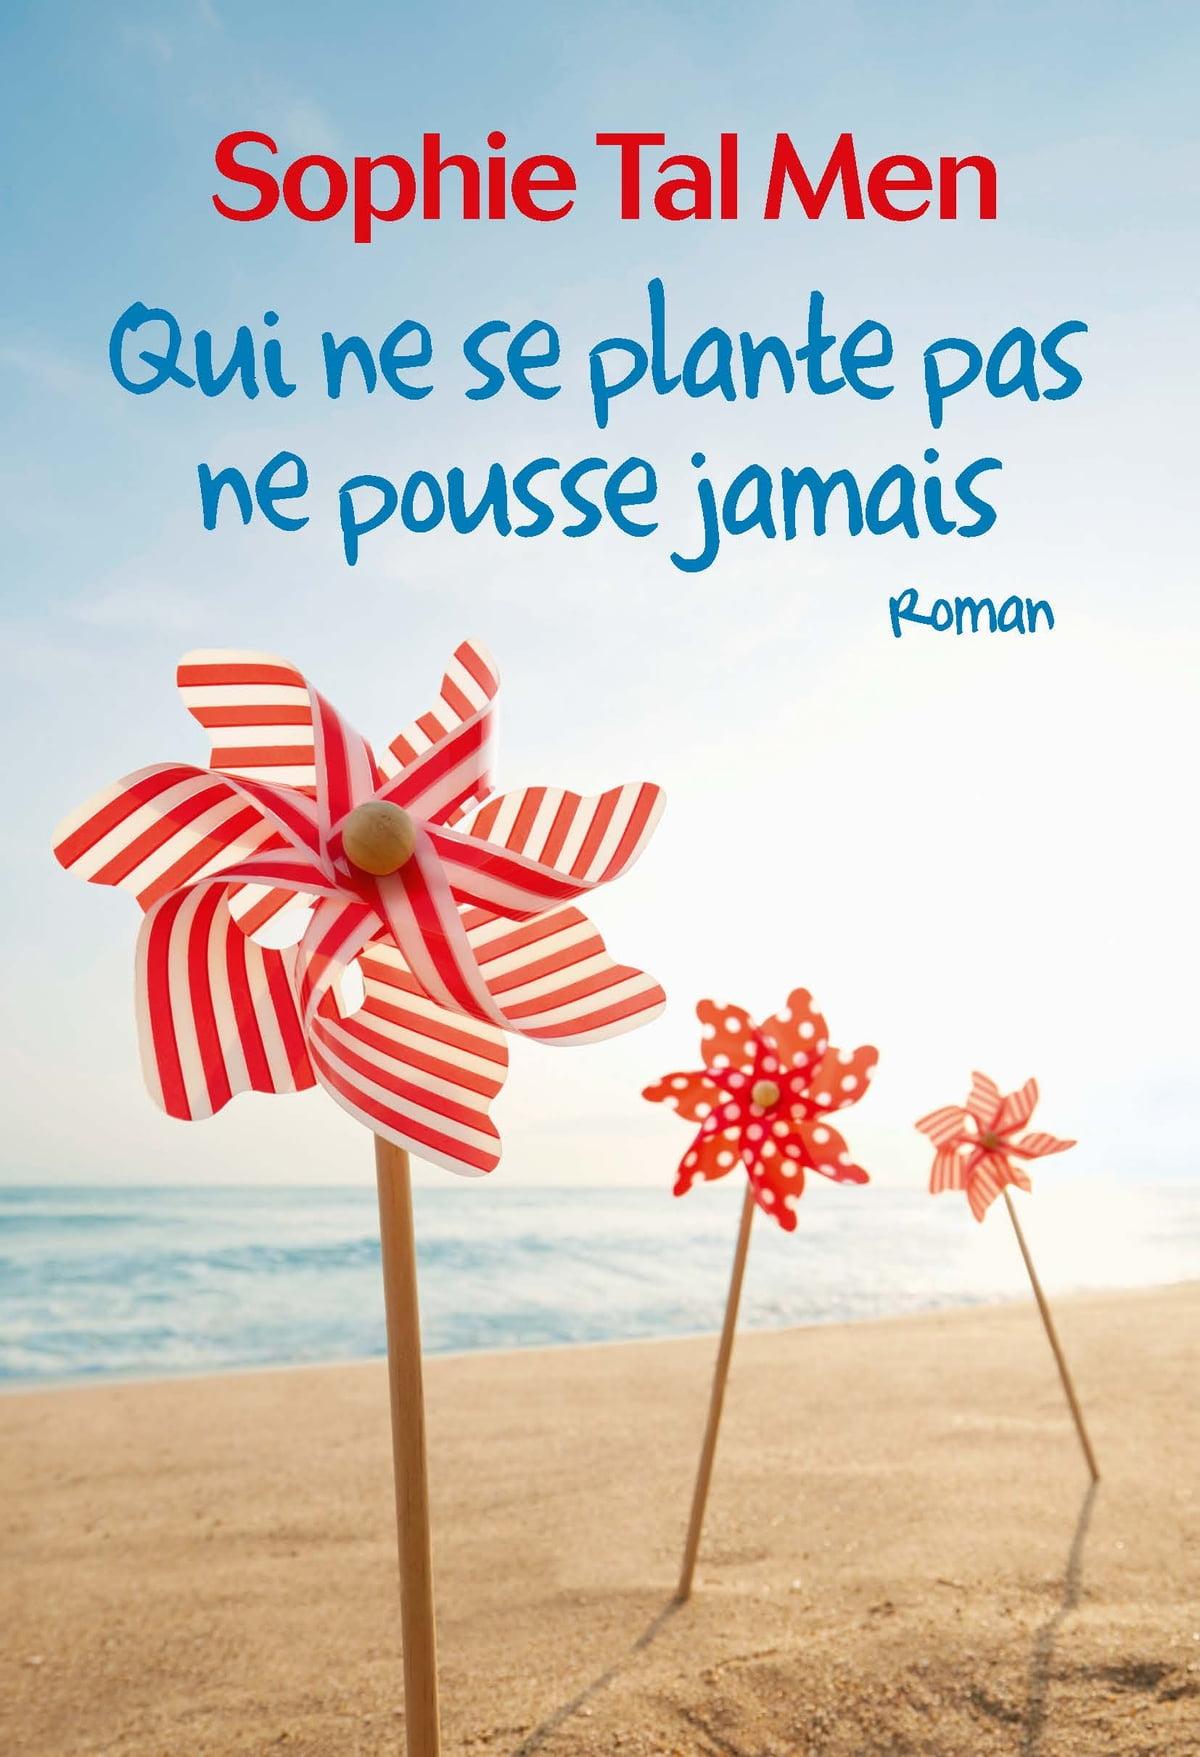 Qui Ne Se Plante Pas Ne Pousse Jamais : plante, pousse, jamais, Plante, Pousse, Jamais, EBook, Sophie, Rakuten